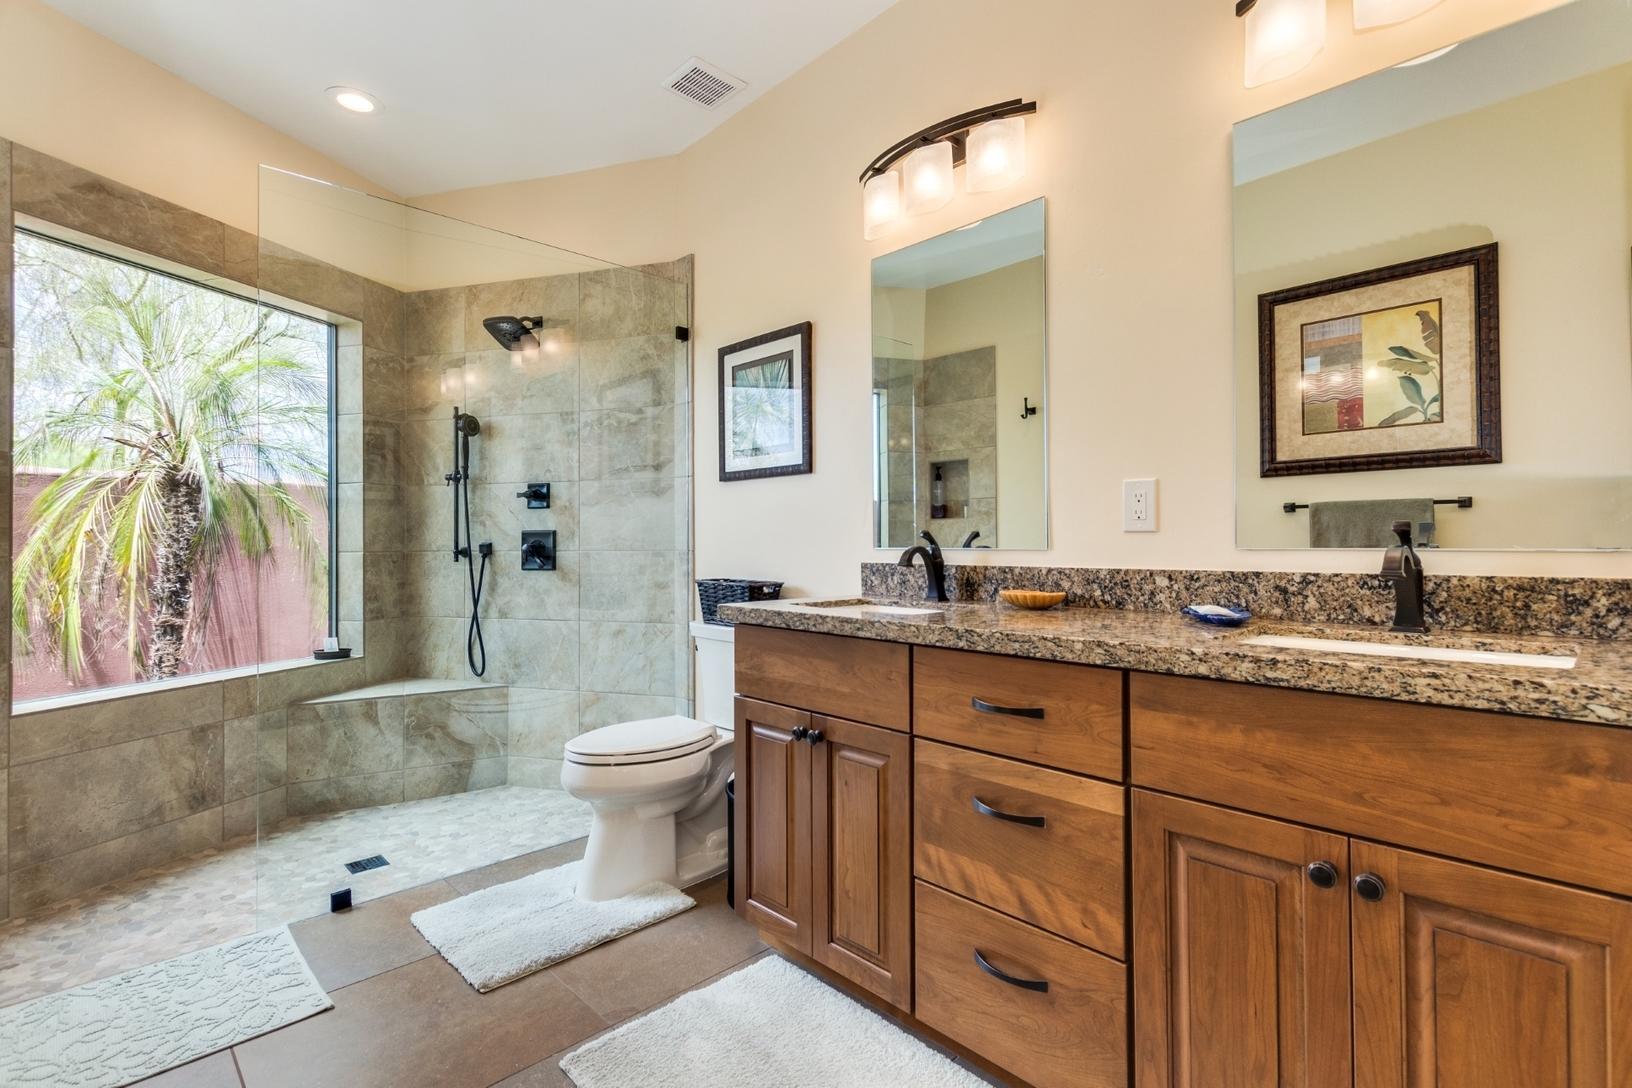 Remodeling - North Scottsdale Bathroom Remodels - North ...